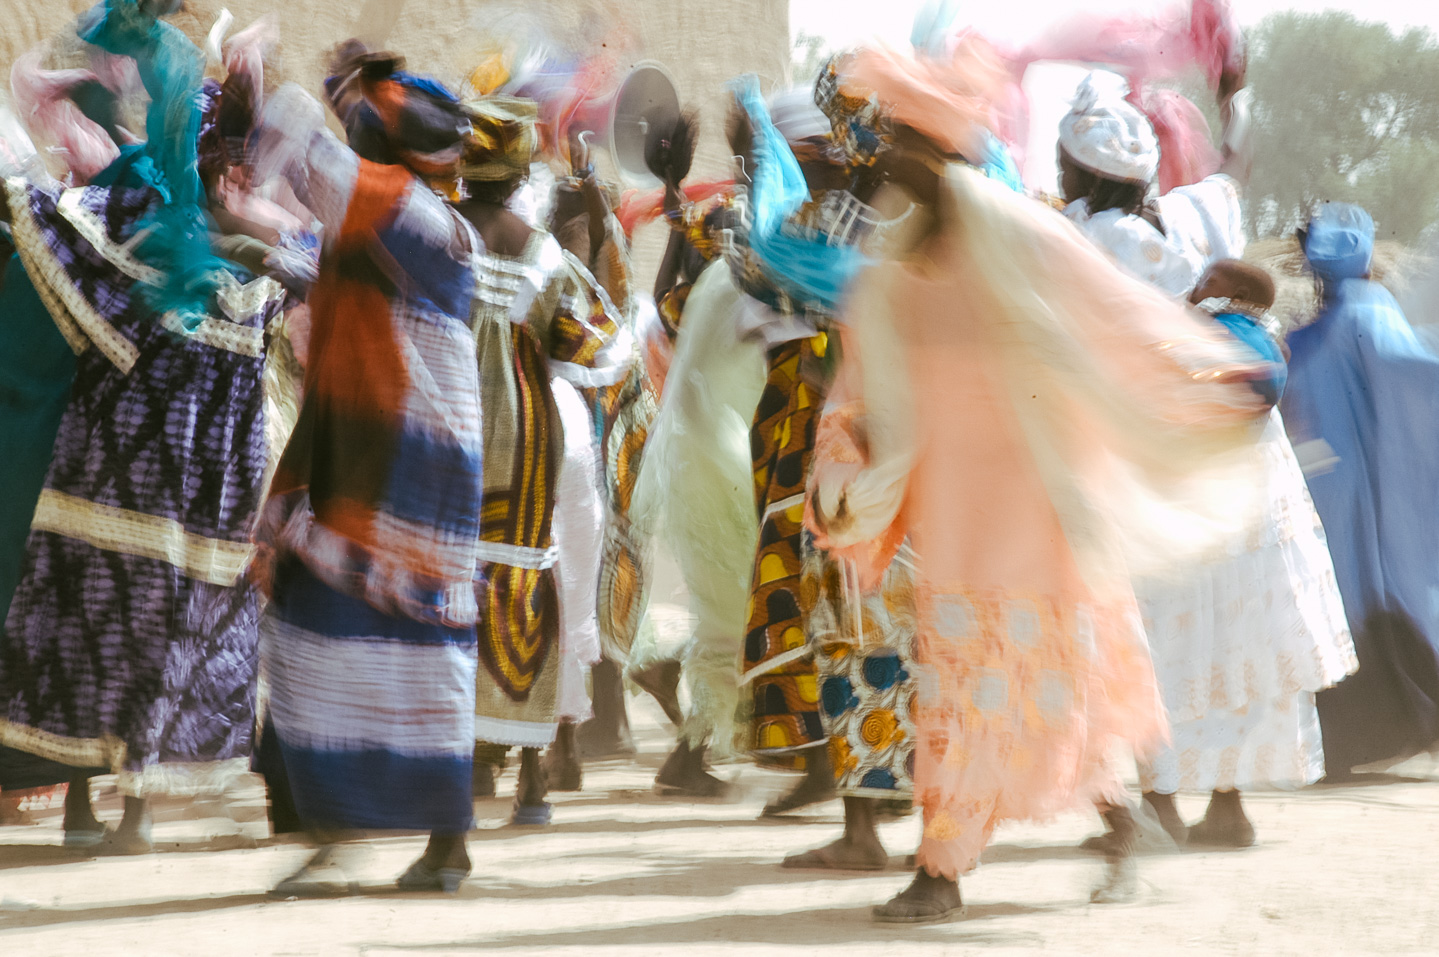 Rund um Afrika - Mali - Westafrika - Transafrika-421